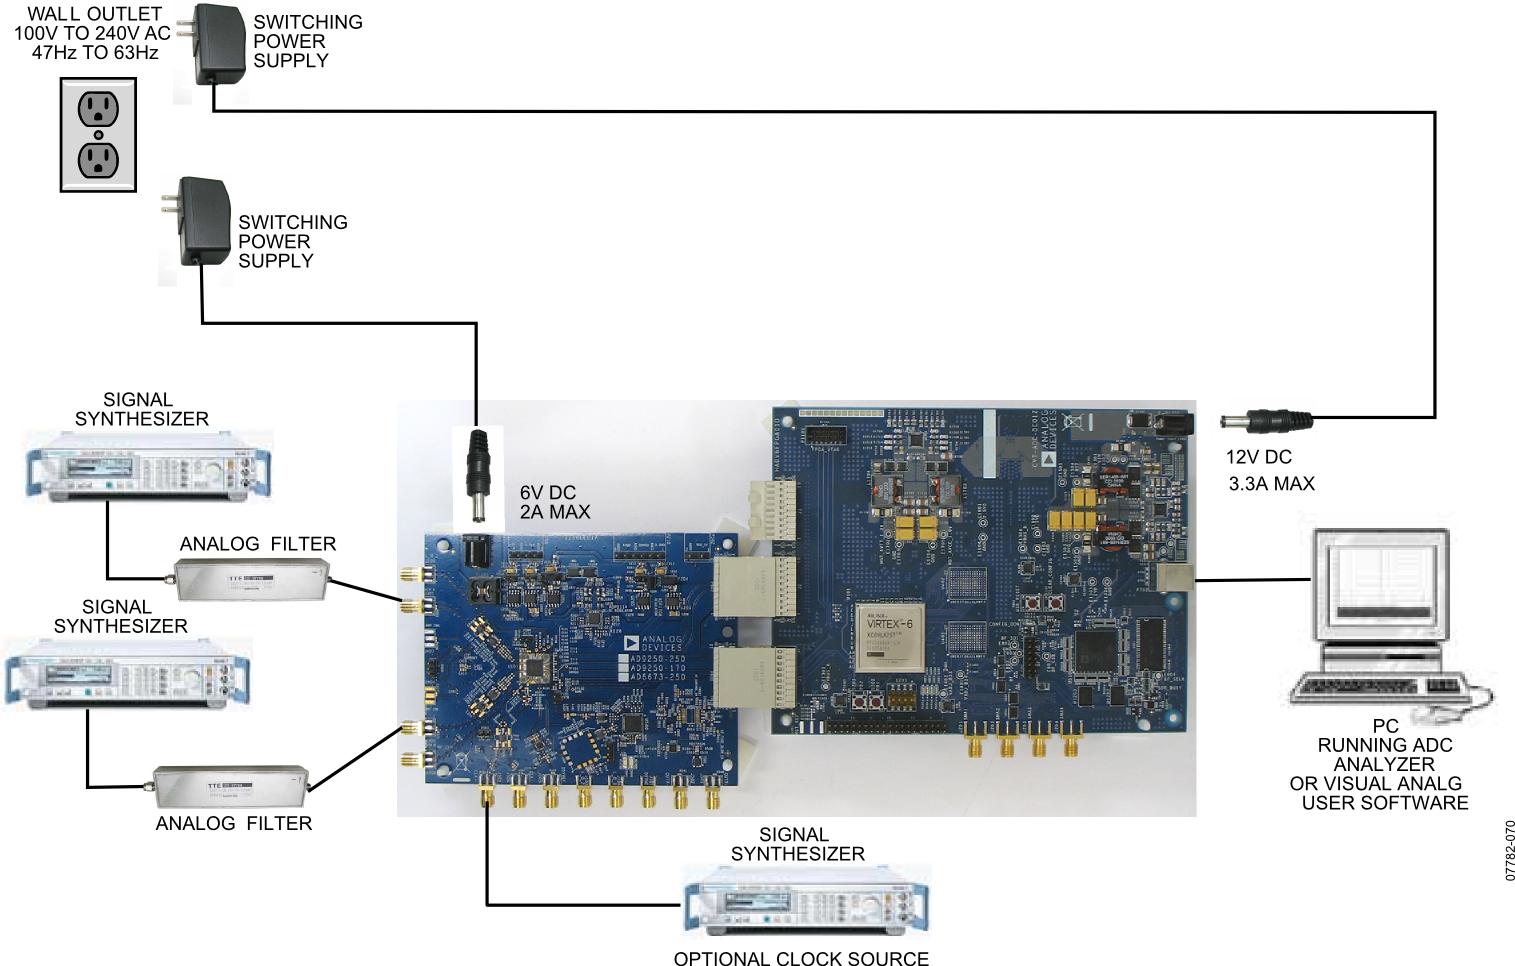 Hsc Adc Evaldz High Speed Converter Evaluation Platform Analog Virtex 6 Block Diagram Typical Data Capture Setup